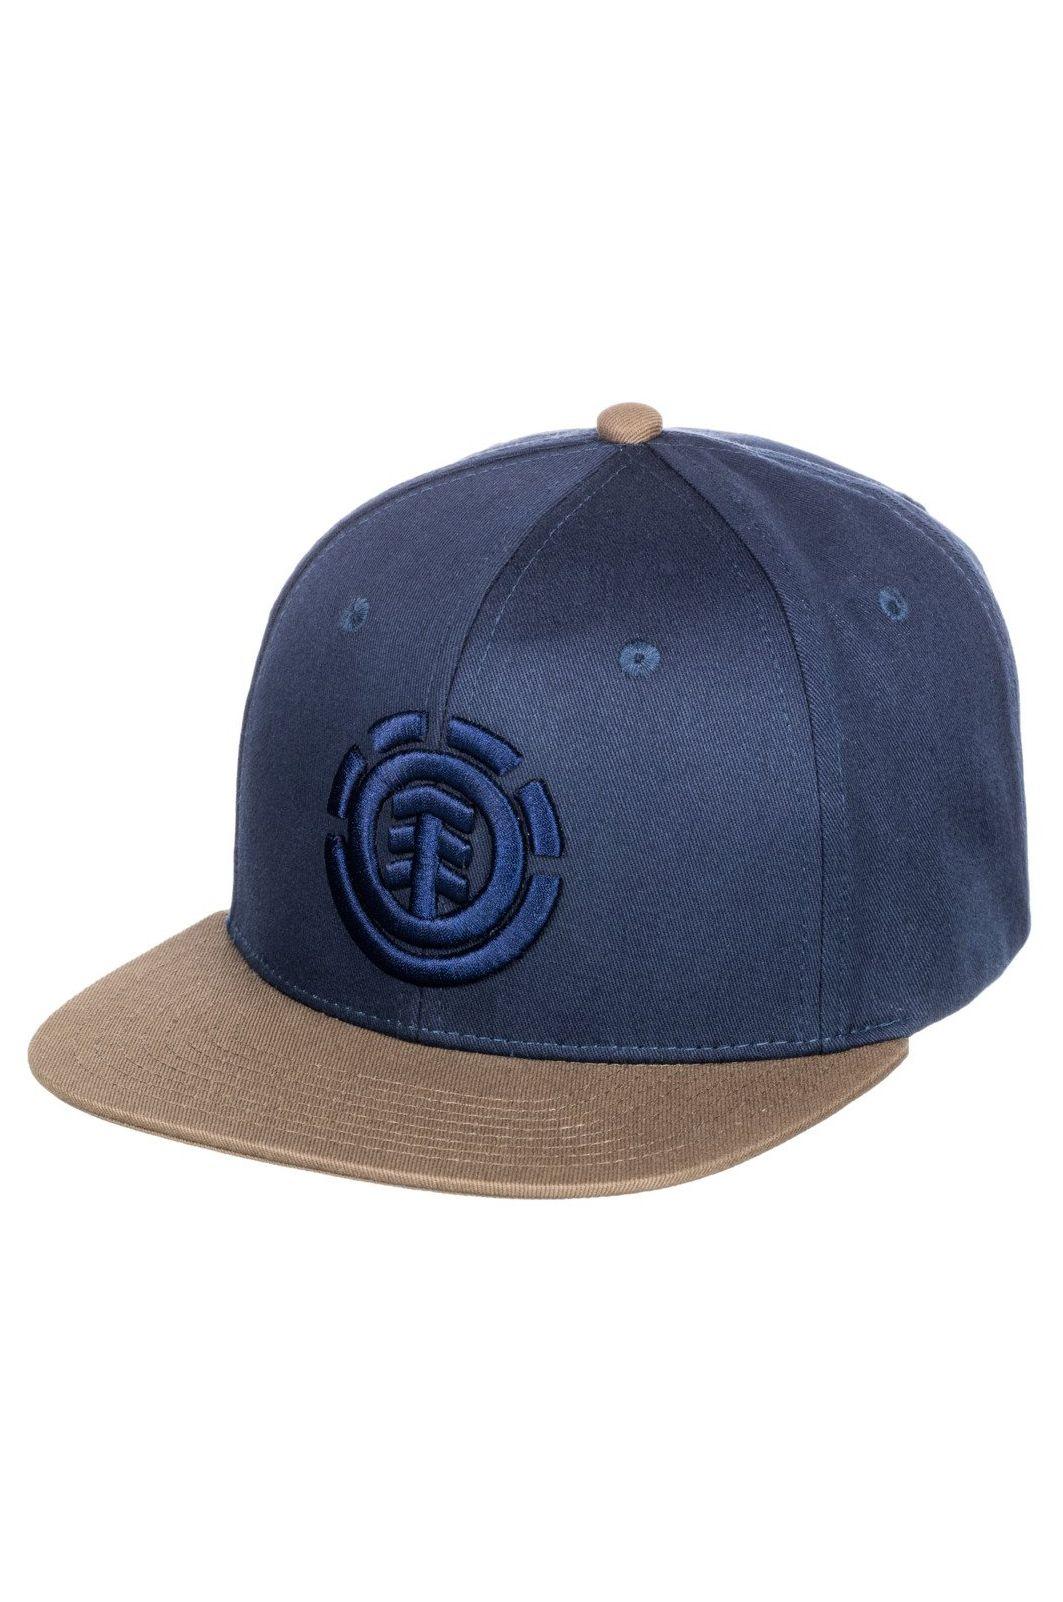 Element Cap   KNUTSEN CAP Insignia Blue H